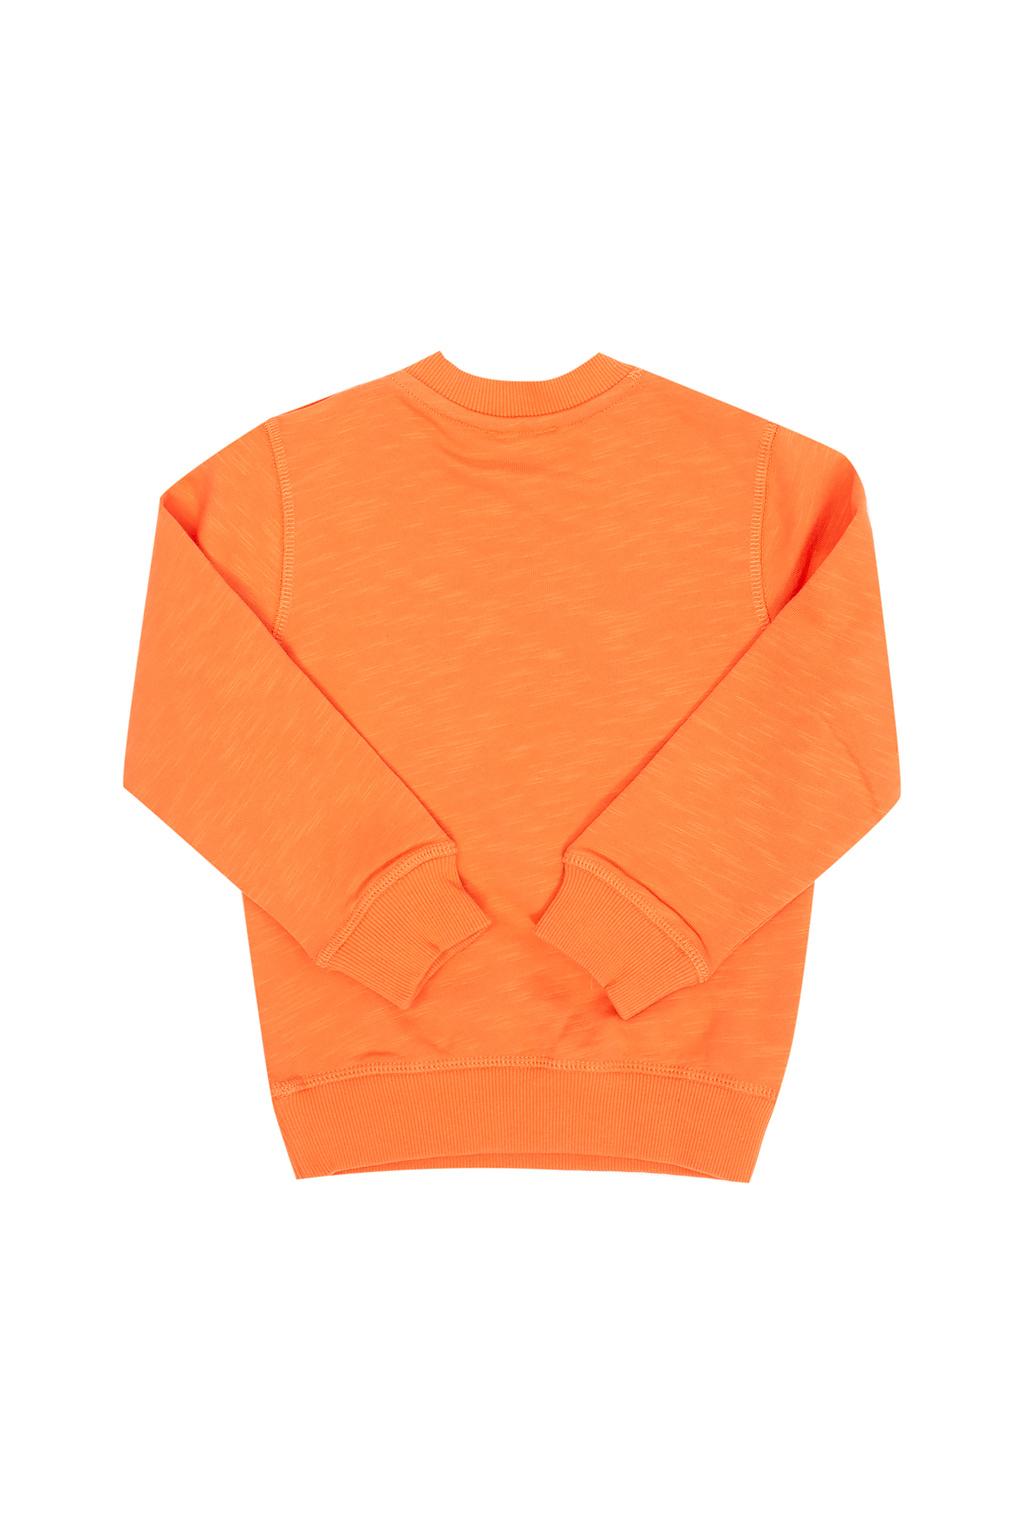 Kenzo Kids Tiger head sweatshirt